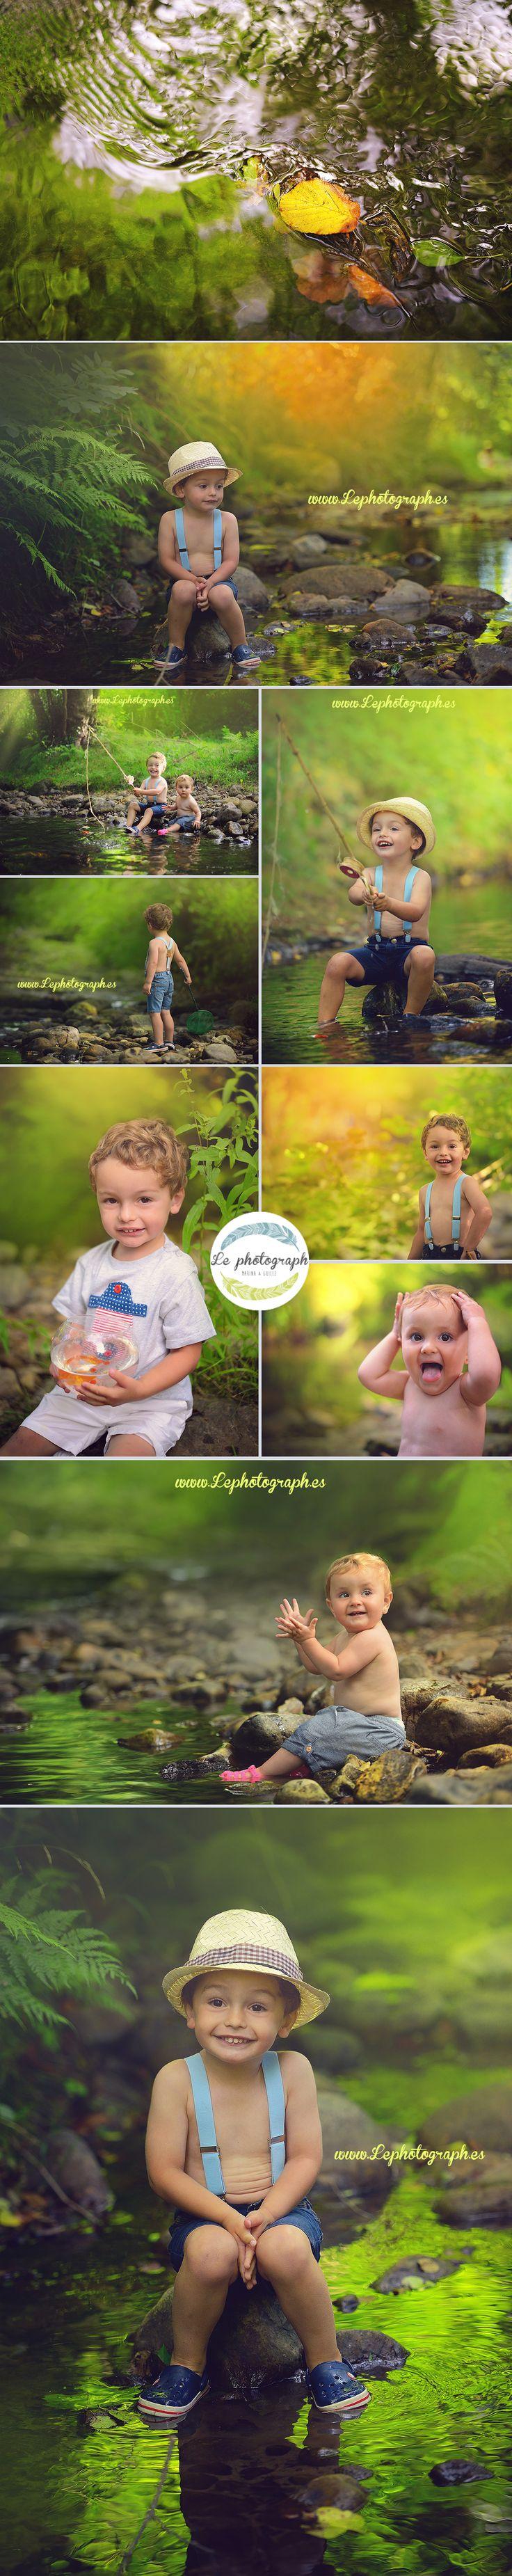 Sesión de fotos creativa en el río con niños - Children creative photoshoot in the river. Photography inspiration www.lephotograph.es